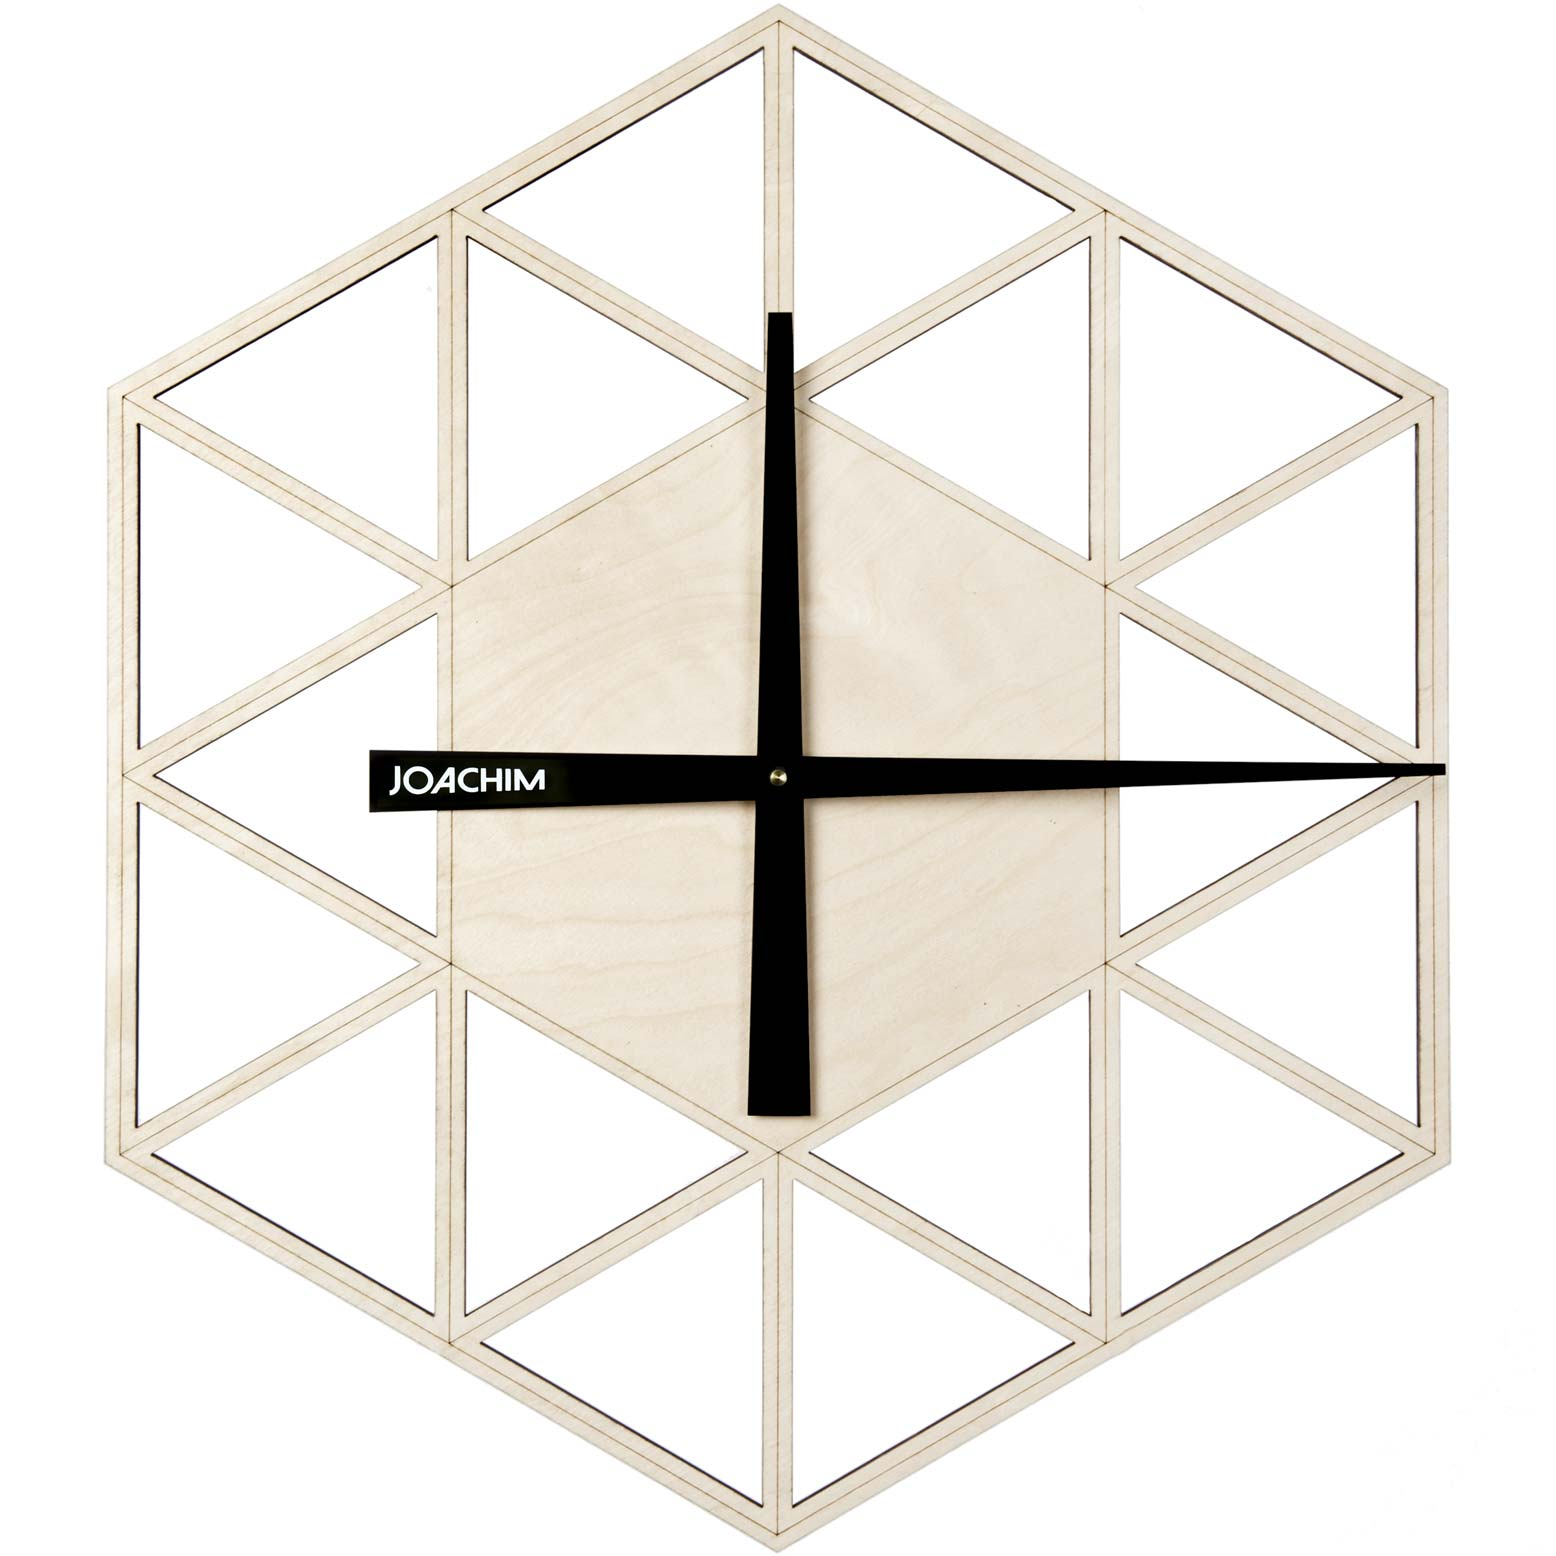 geoforma-joachim-clocks-plant-the-planet